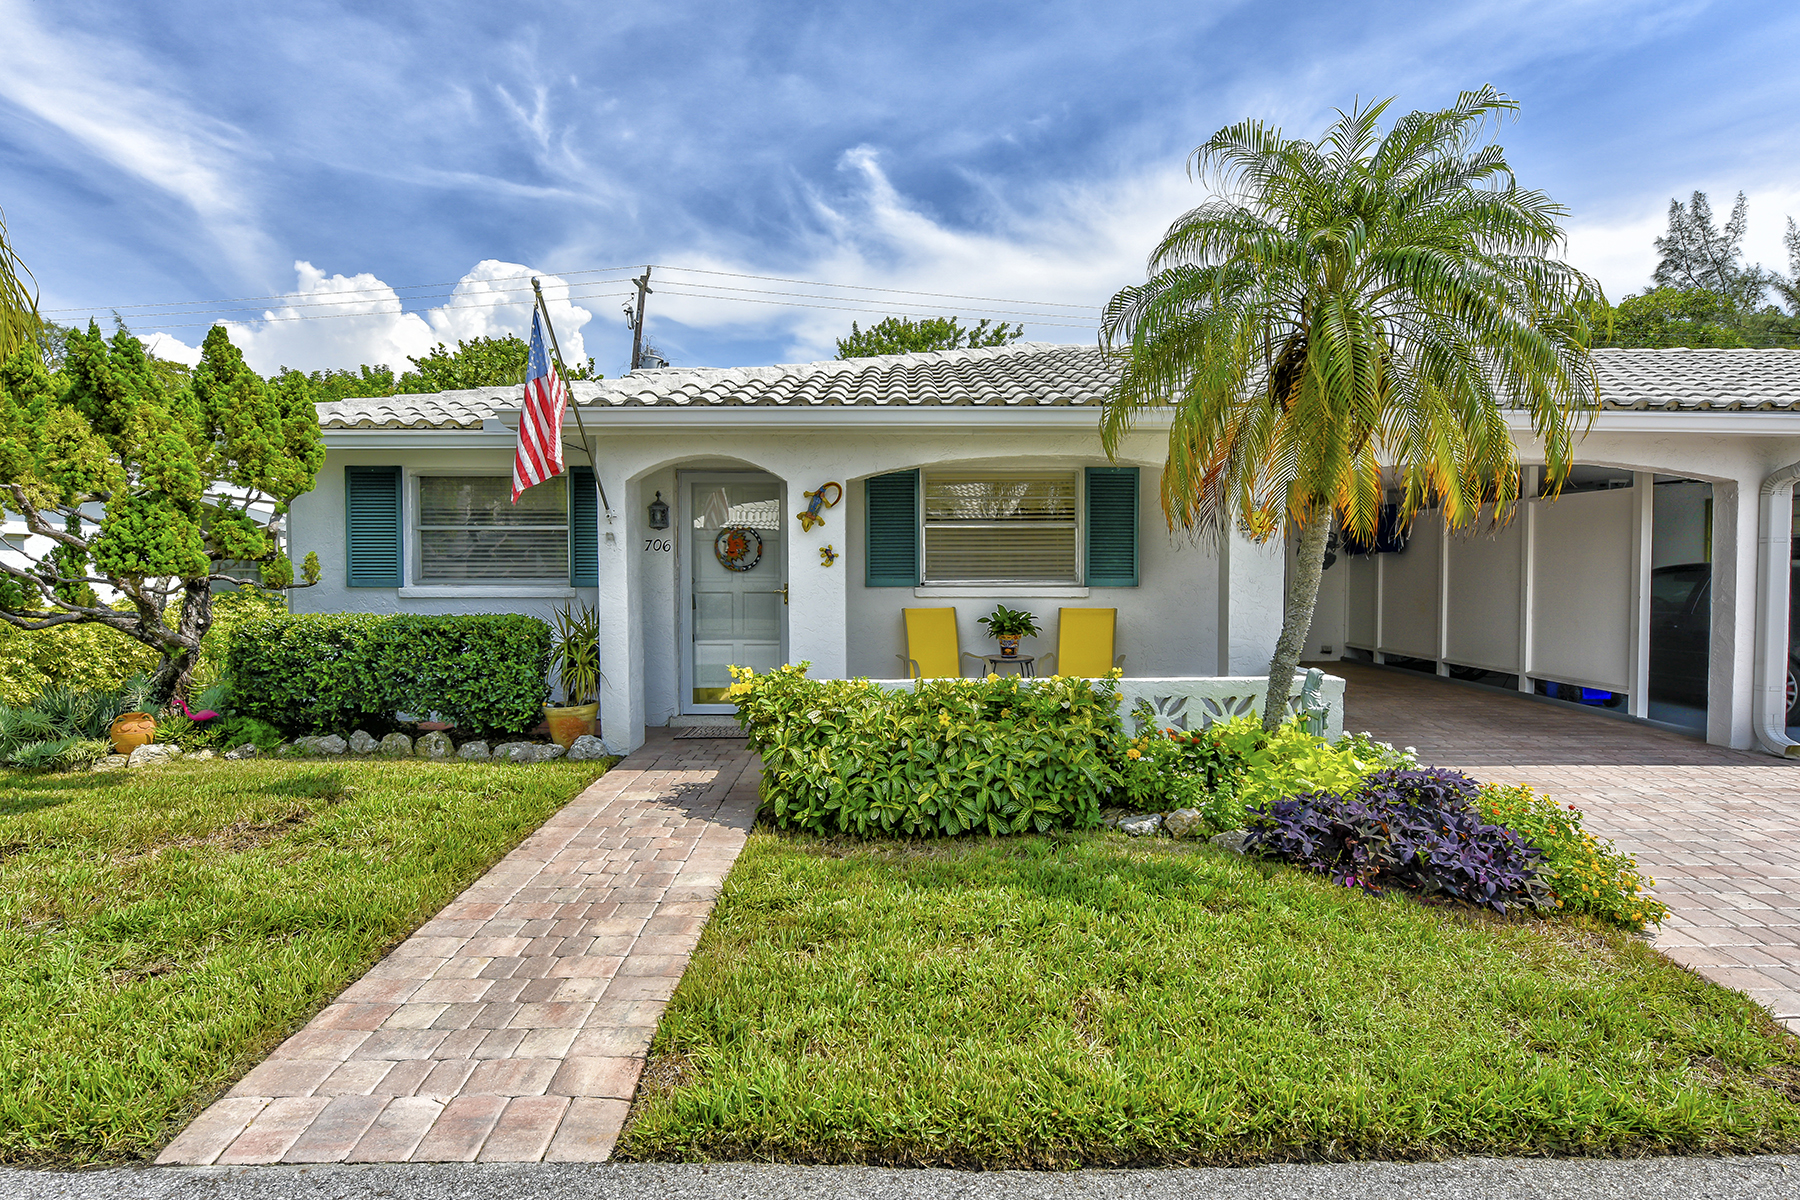 Townhouse for Sale at SPANISH MAIN YACHT CLUB 706 Spanish Dr S Longboat Key, Florida 34228 United States